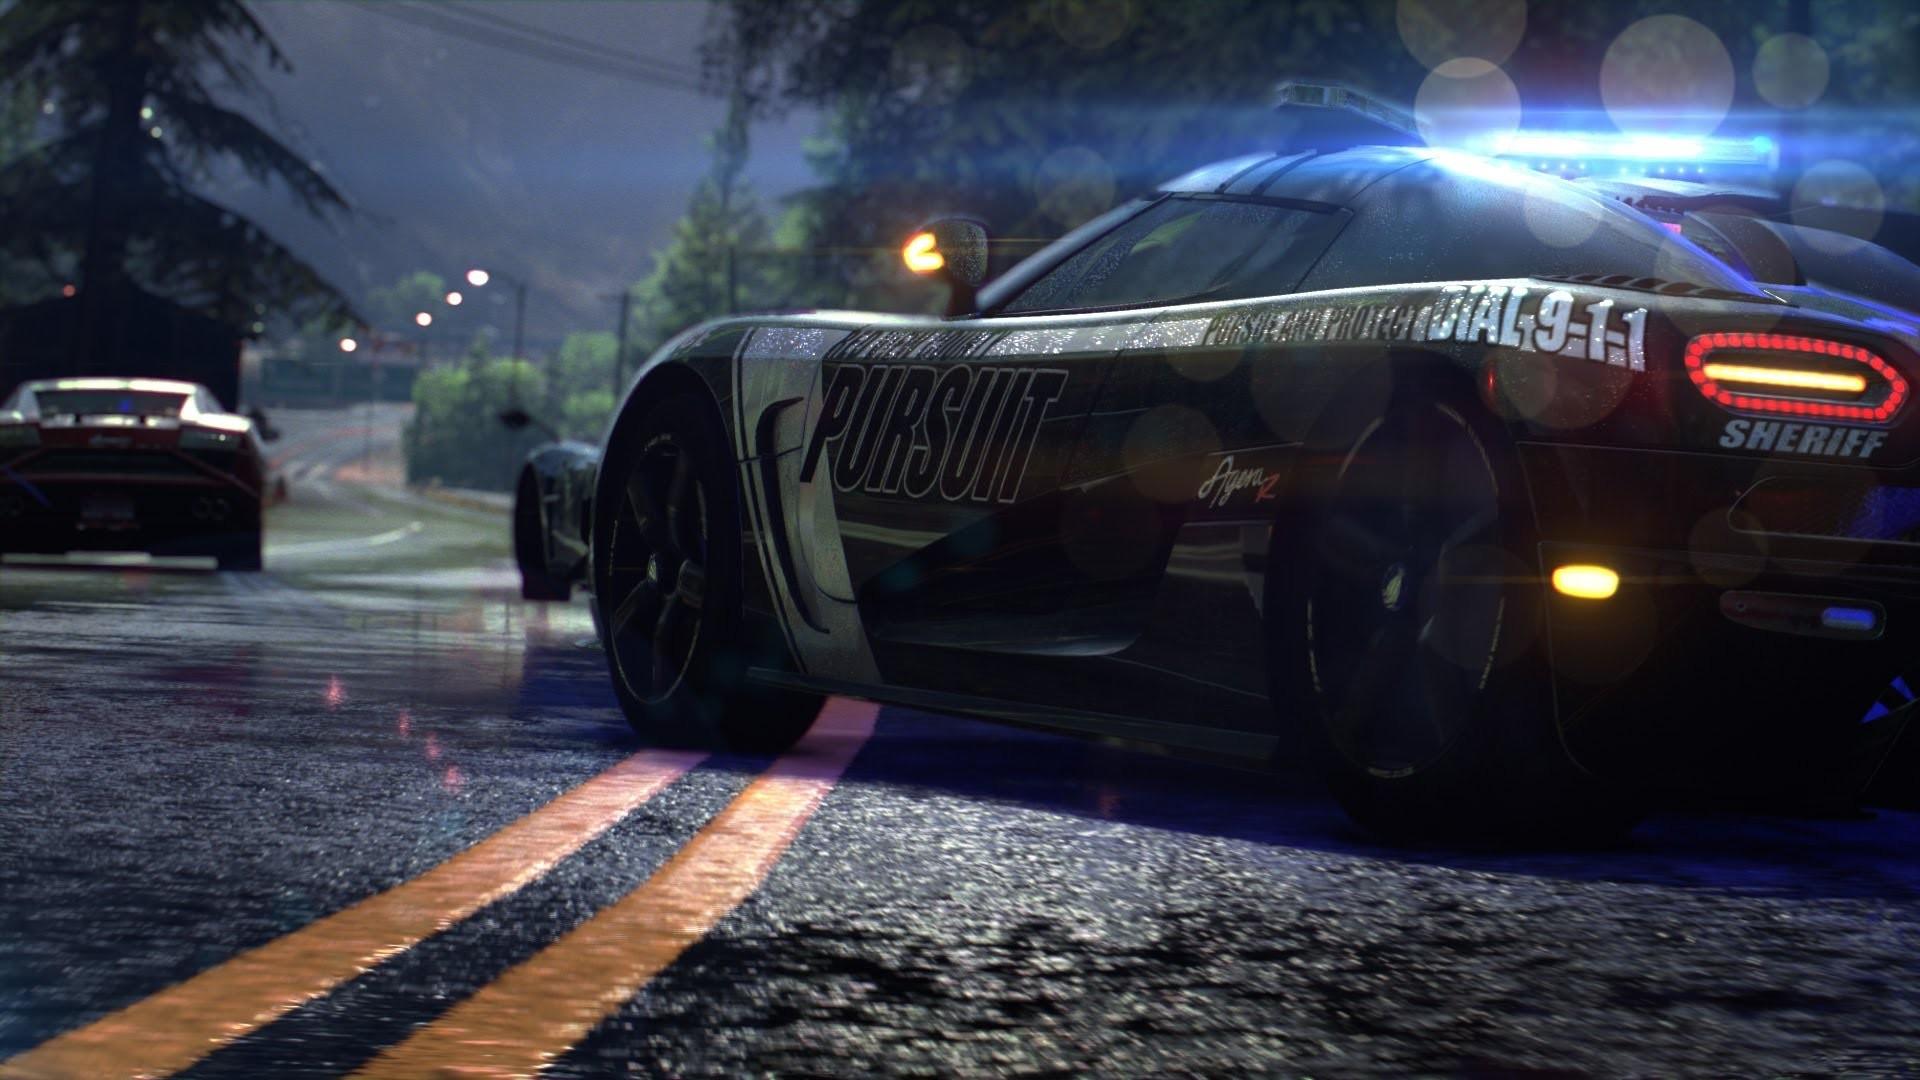 Fond D Ecran Vehicule Voiture De Sport Koenigsegg Au